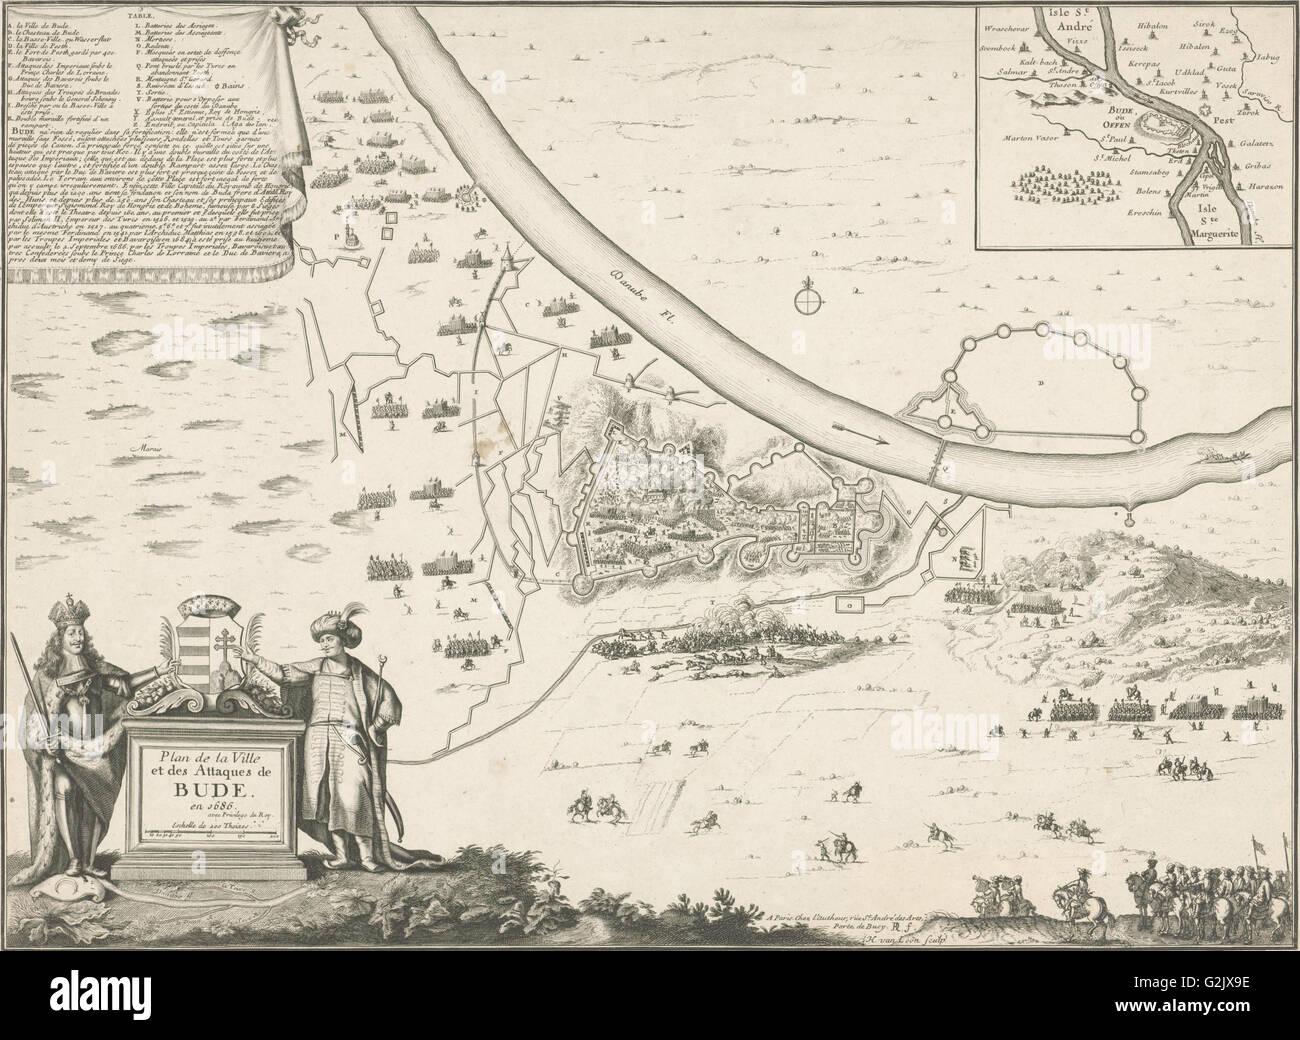 map of buda 1686 harmanus van loon lodewijk xiv koning van frankrijk